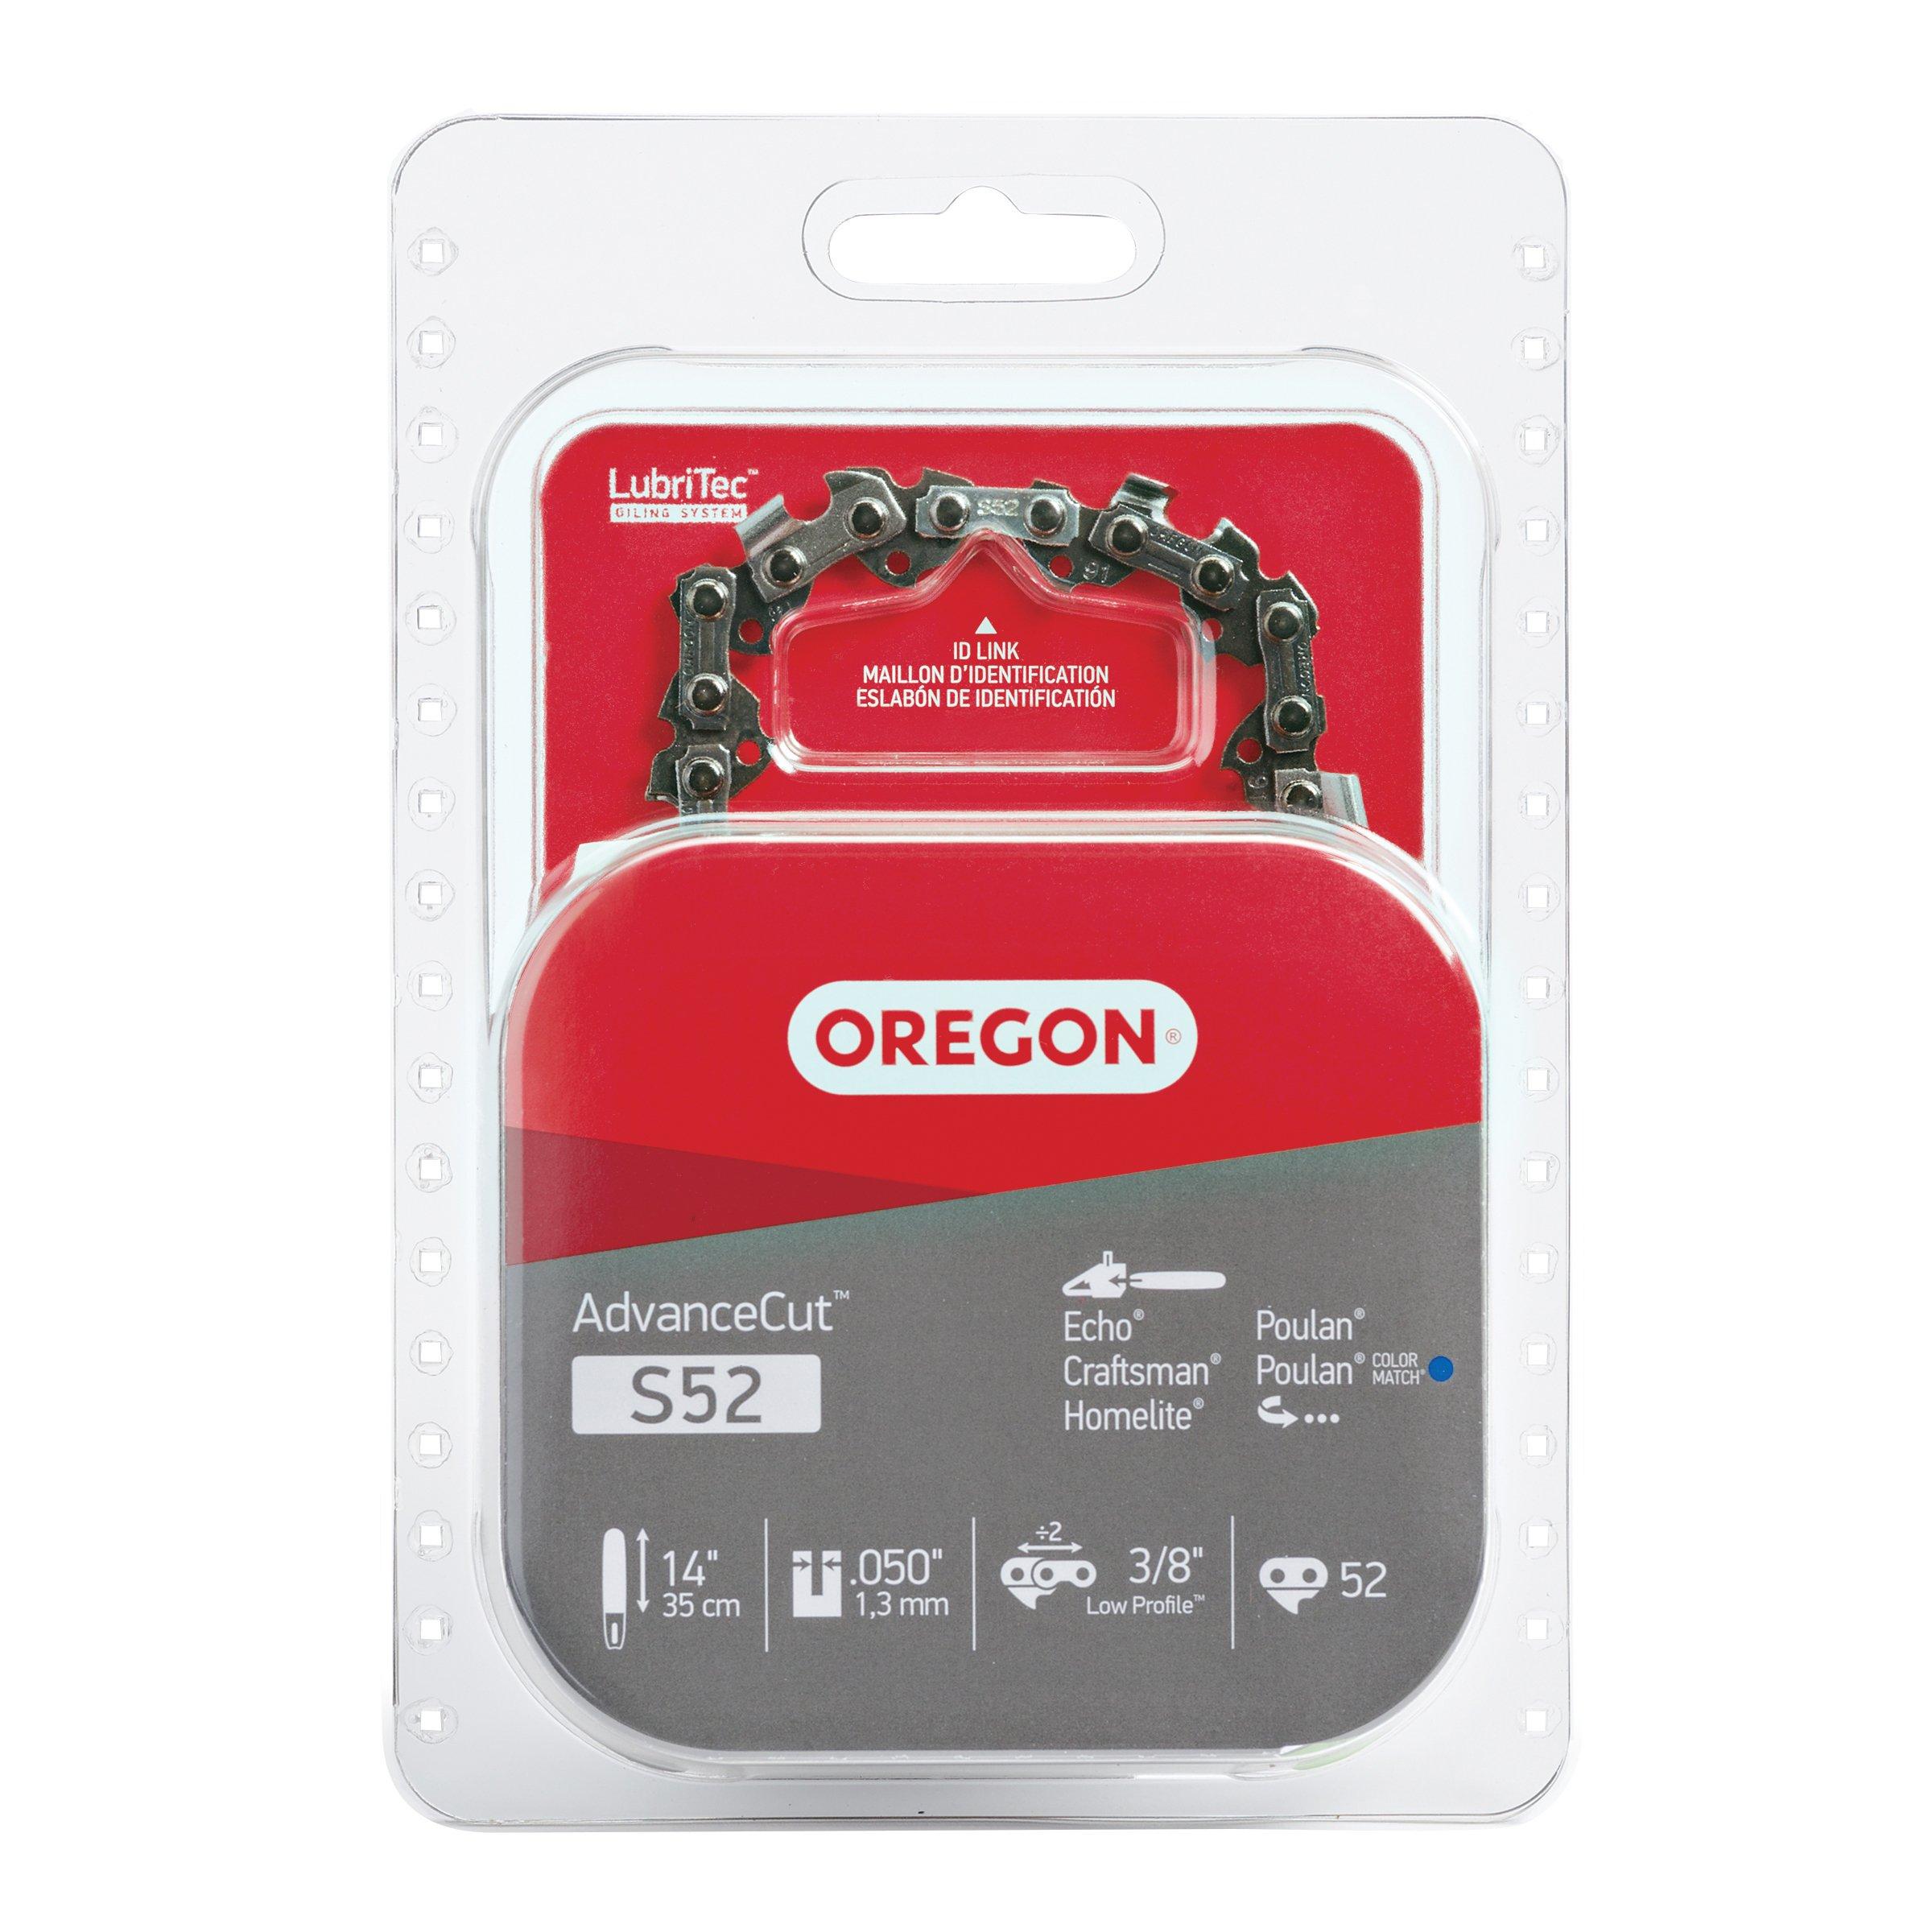 Oregon S52 AdvanceCut 14-Inch Chainsaw Chain Fits Craftsman, Echo, Homelite, Poulan by Oregon